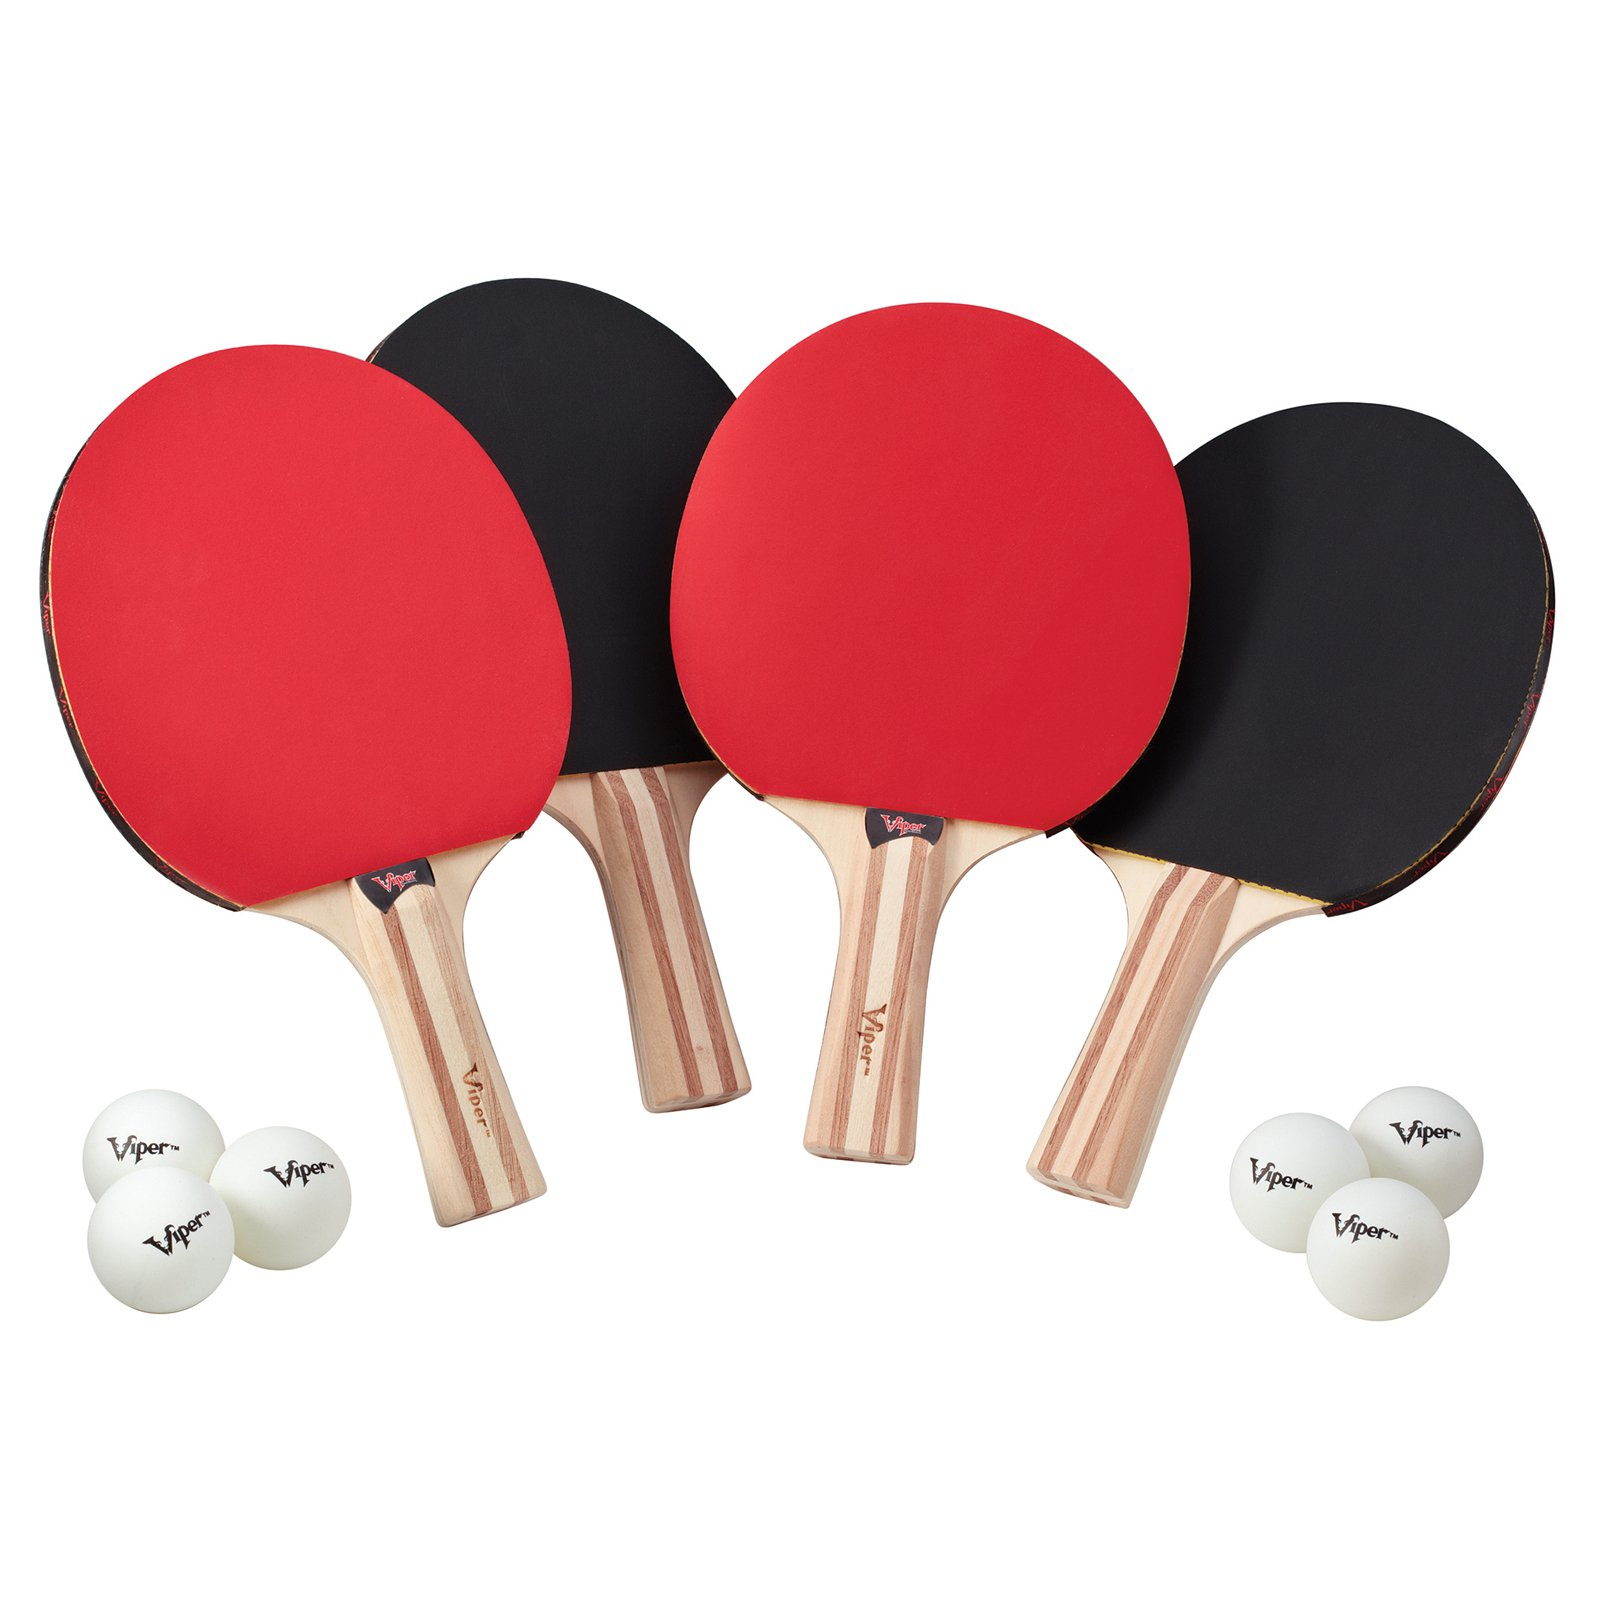 Viper Four-Racket Table Tennis Set